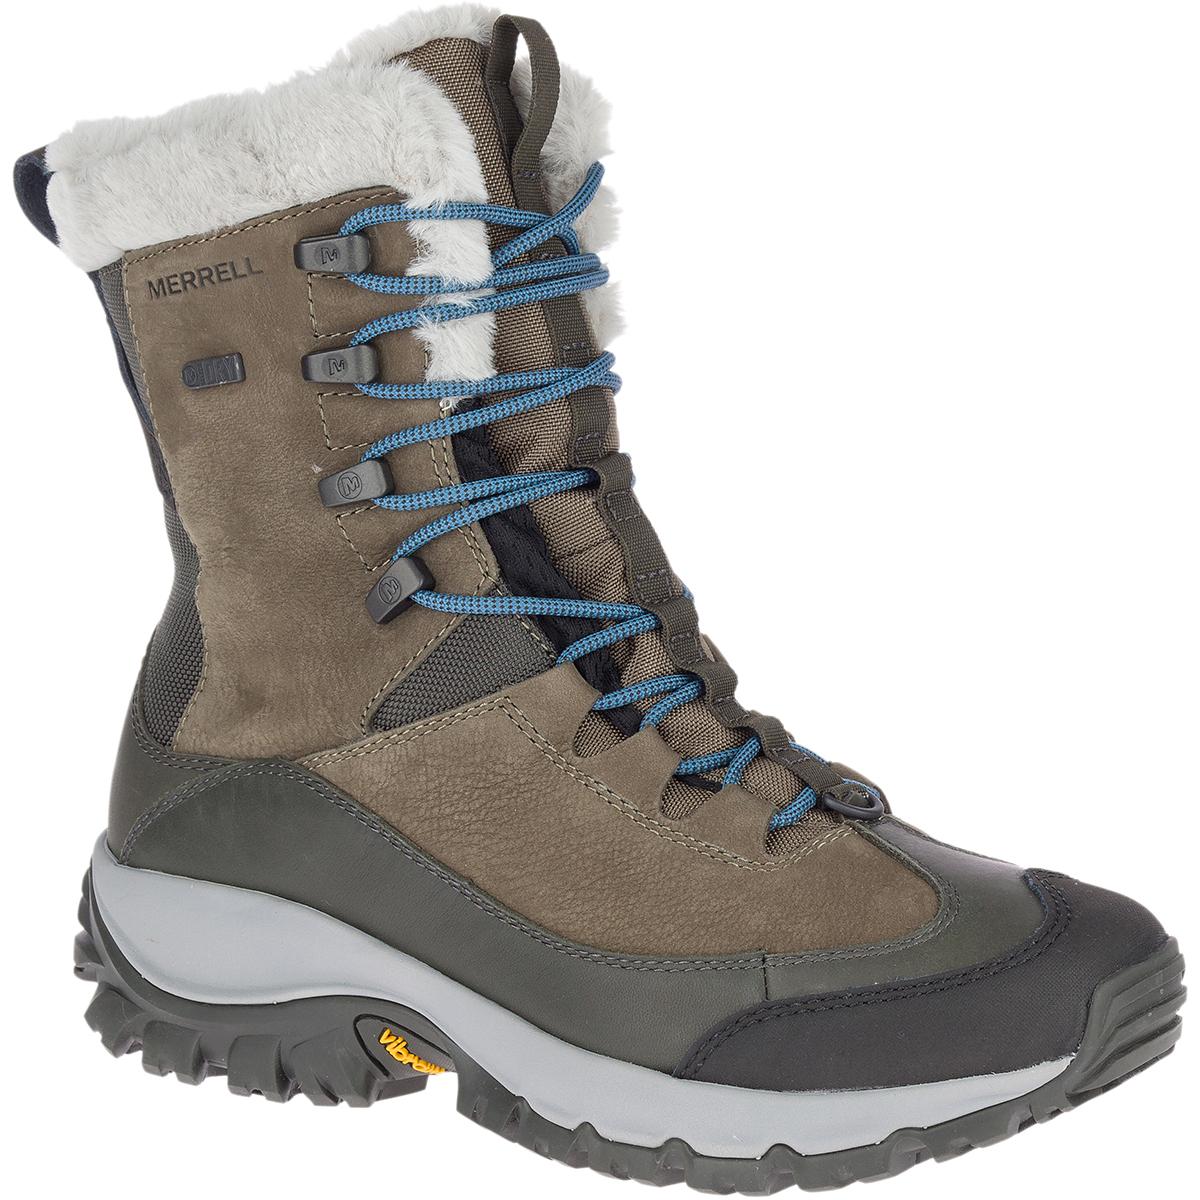 Merrell Women's Thermo Rhea Waterproof Hiking Boot - Green, 7